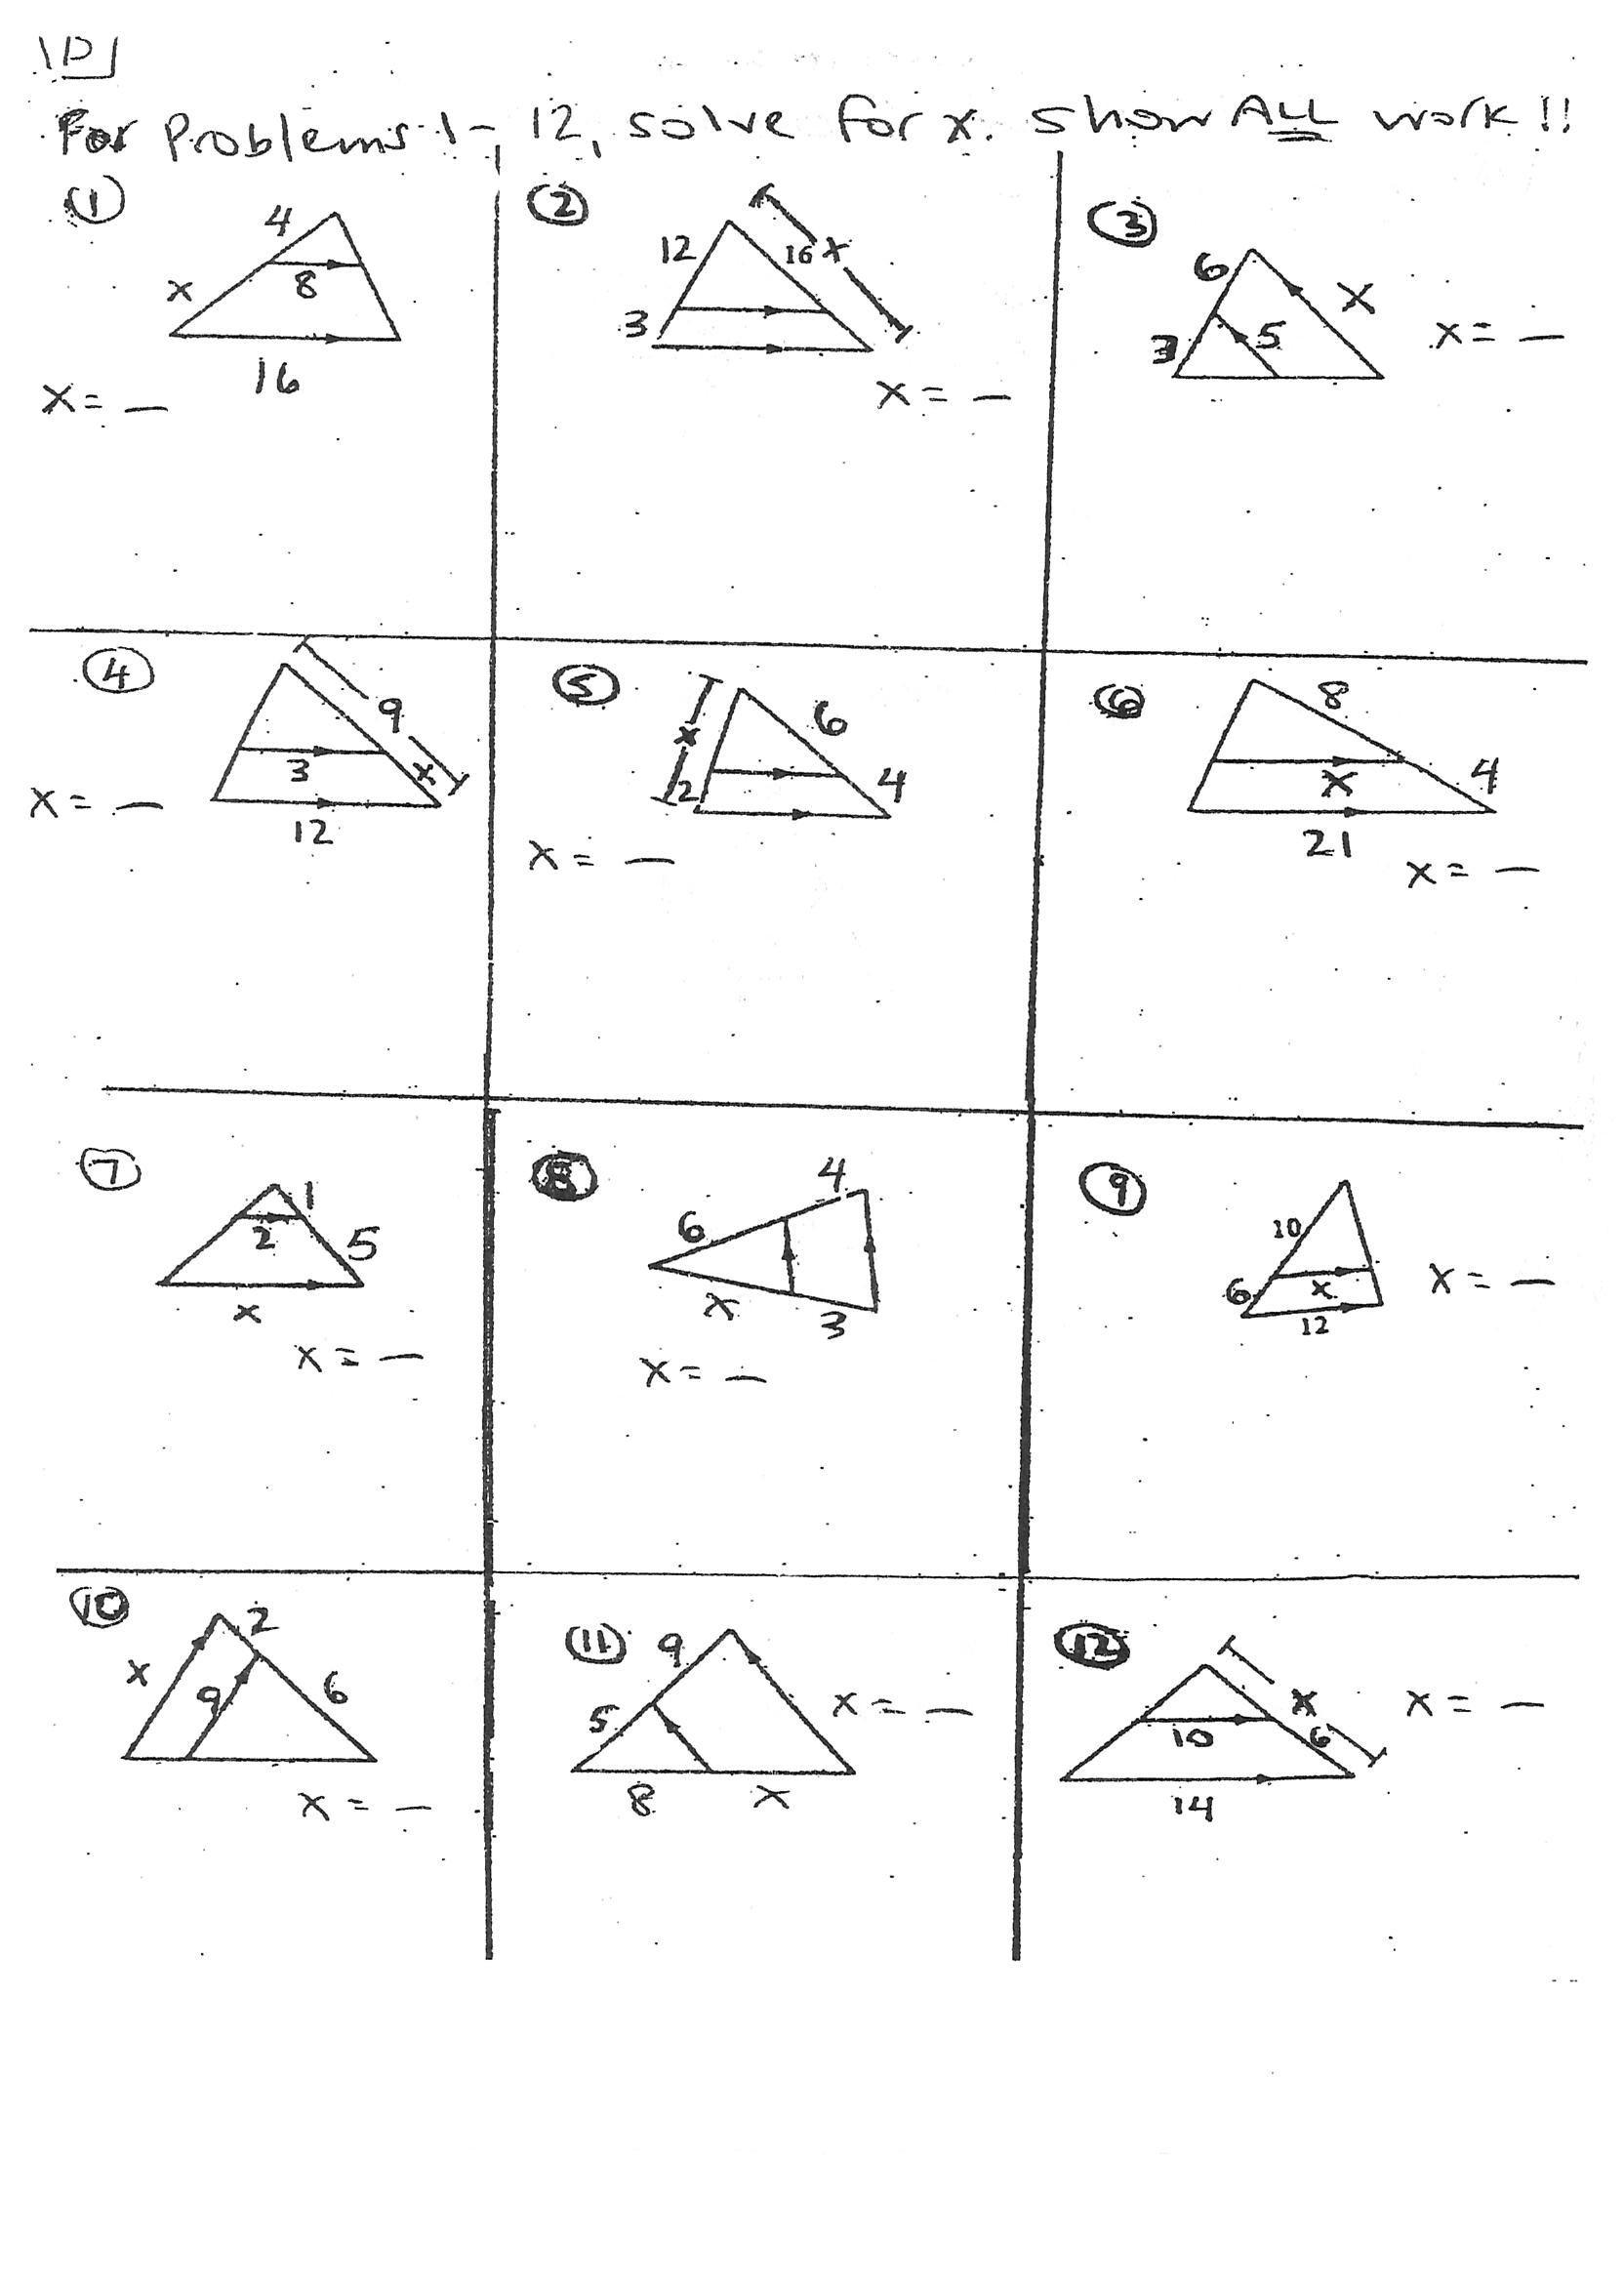 Midsegment theorem Worksheet Answer Key Image Result for Triangle Midsegments Worksheet